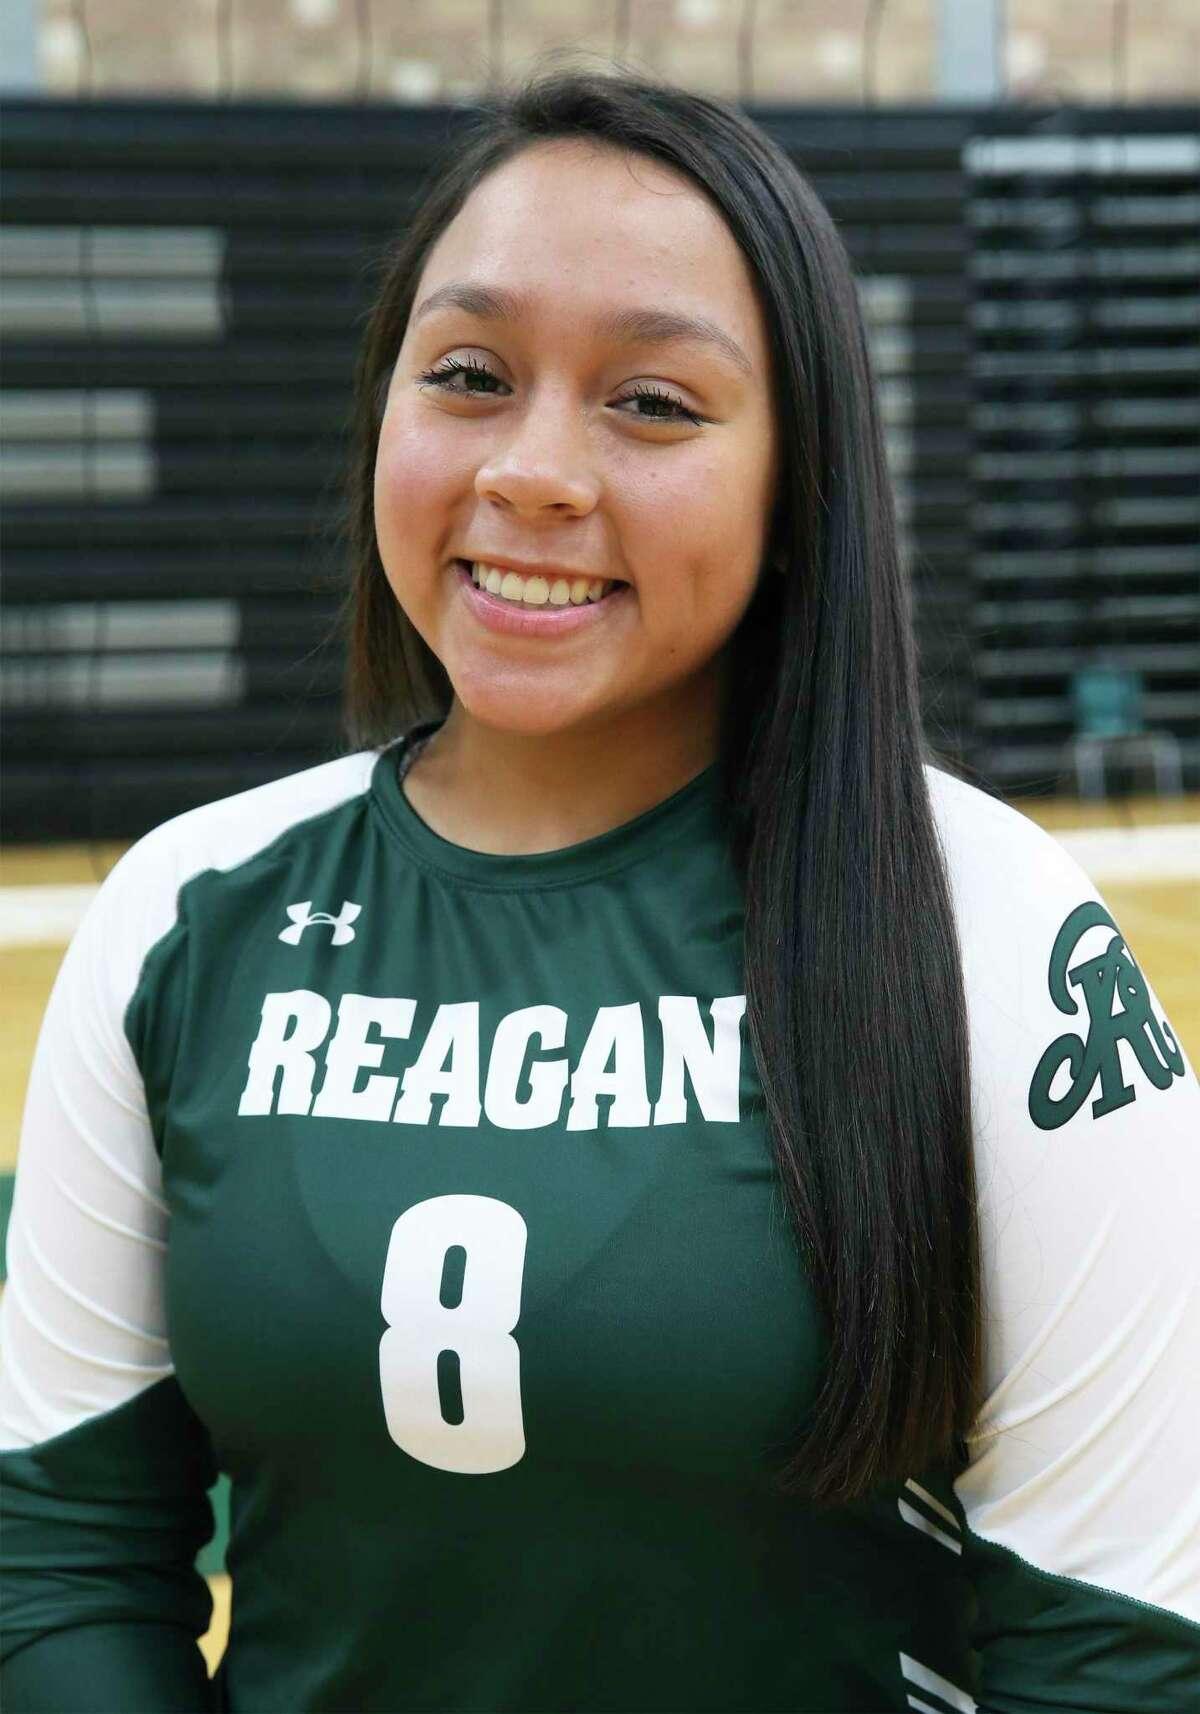 Reagan High School volleyball player Maddie Correa on Sept. 10, 2020.